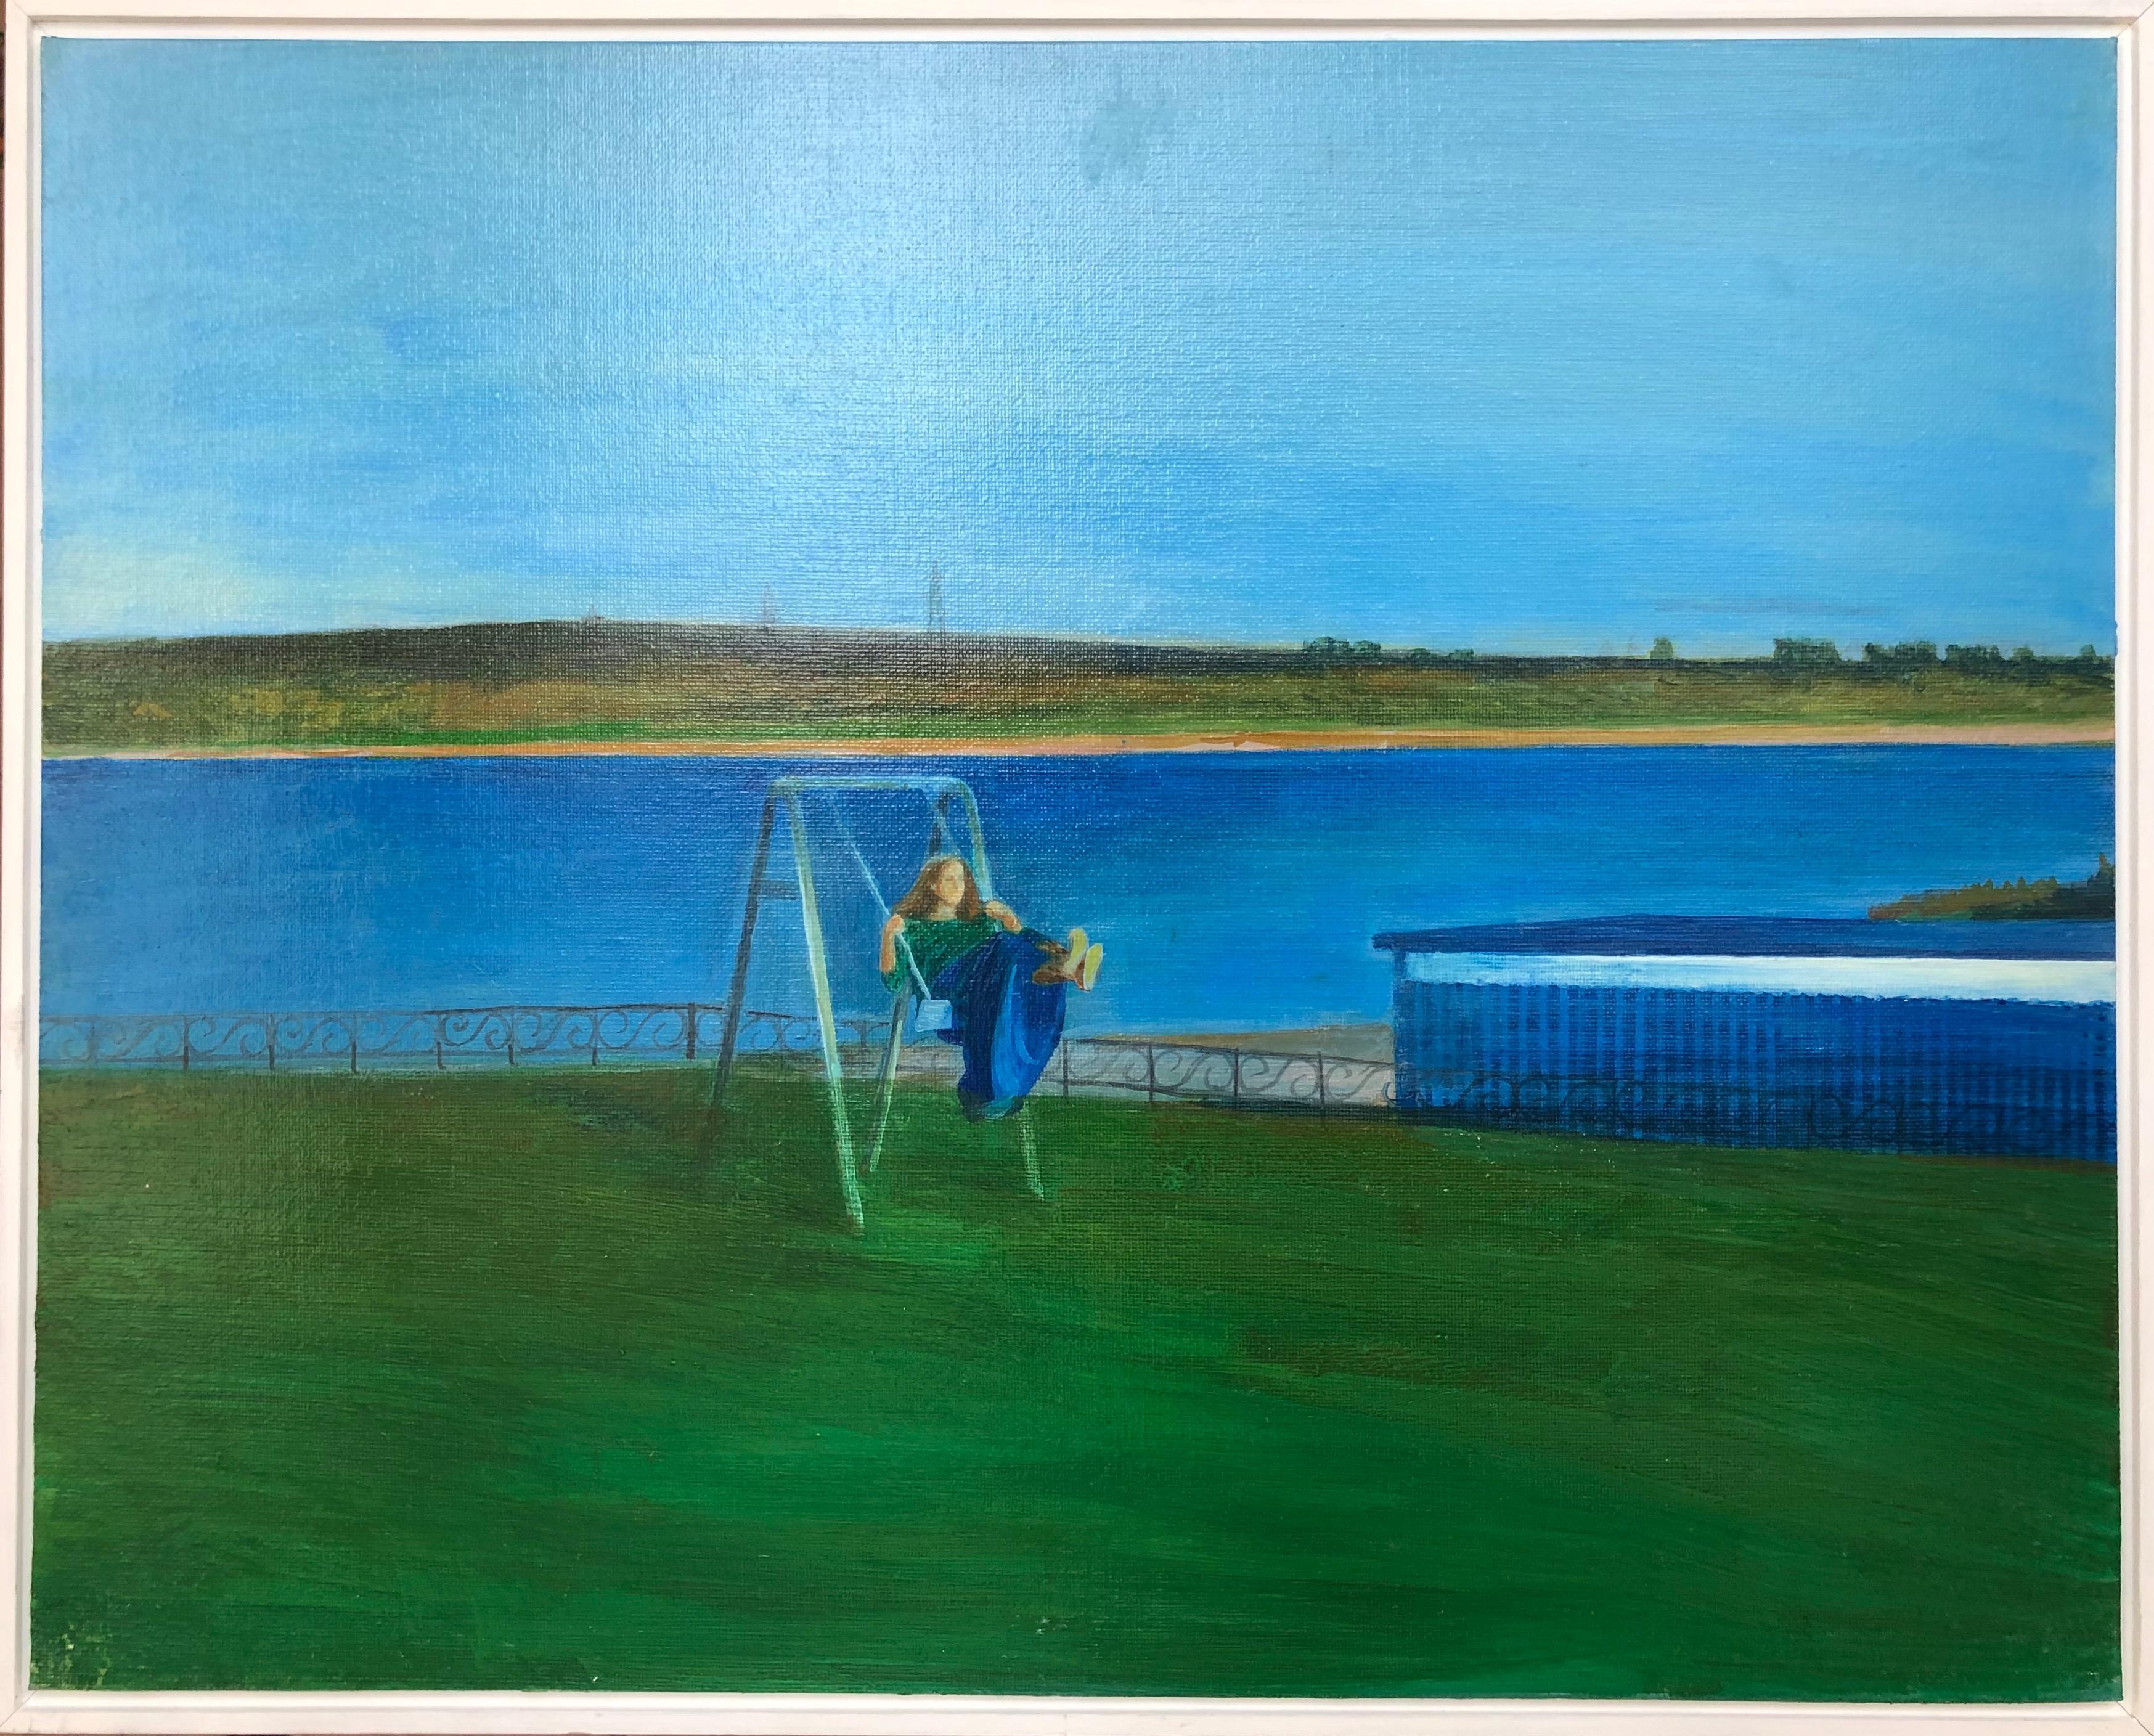 Swing-landscape, canvas on cardboard, oil, framed, made in green, blue color